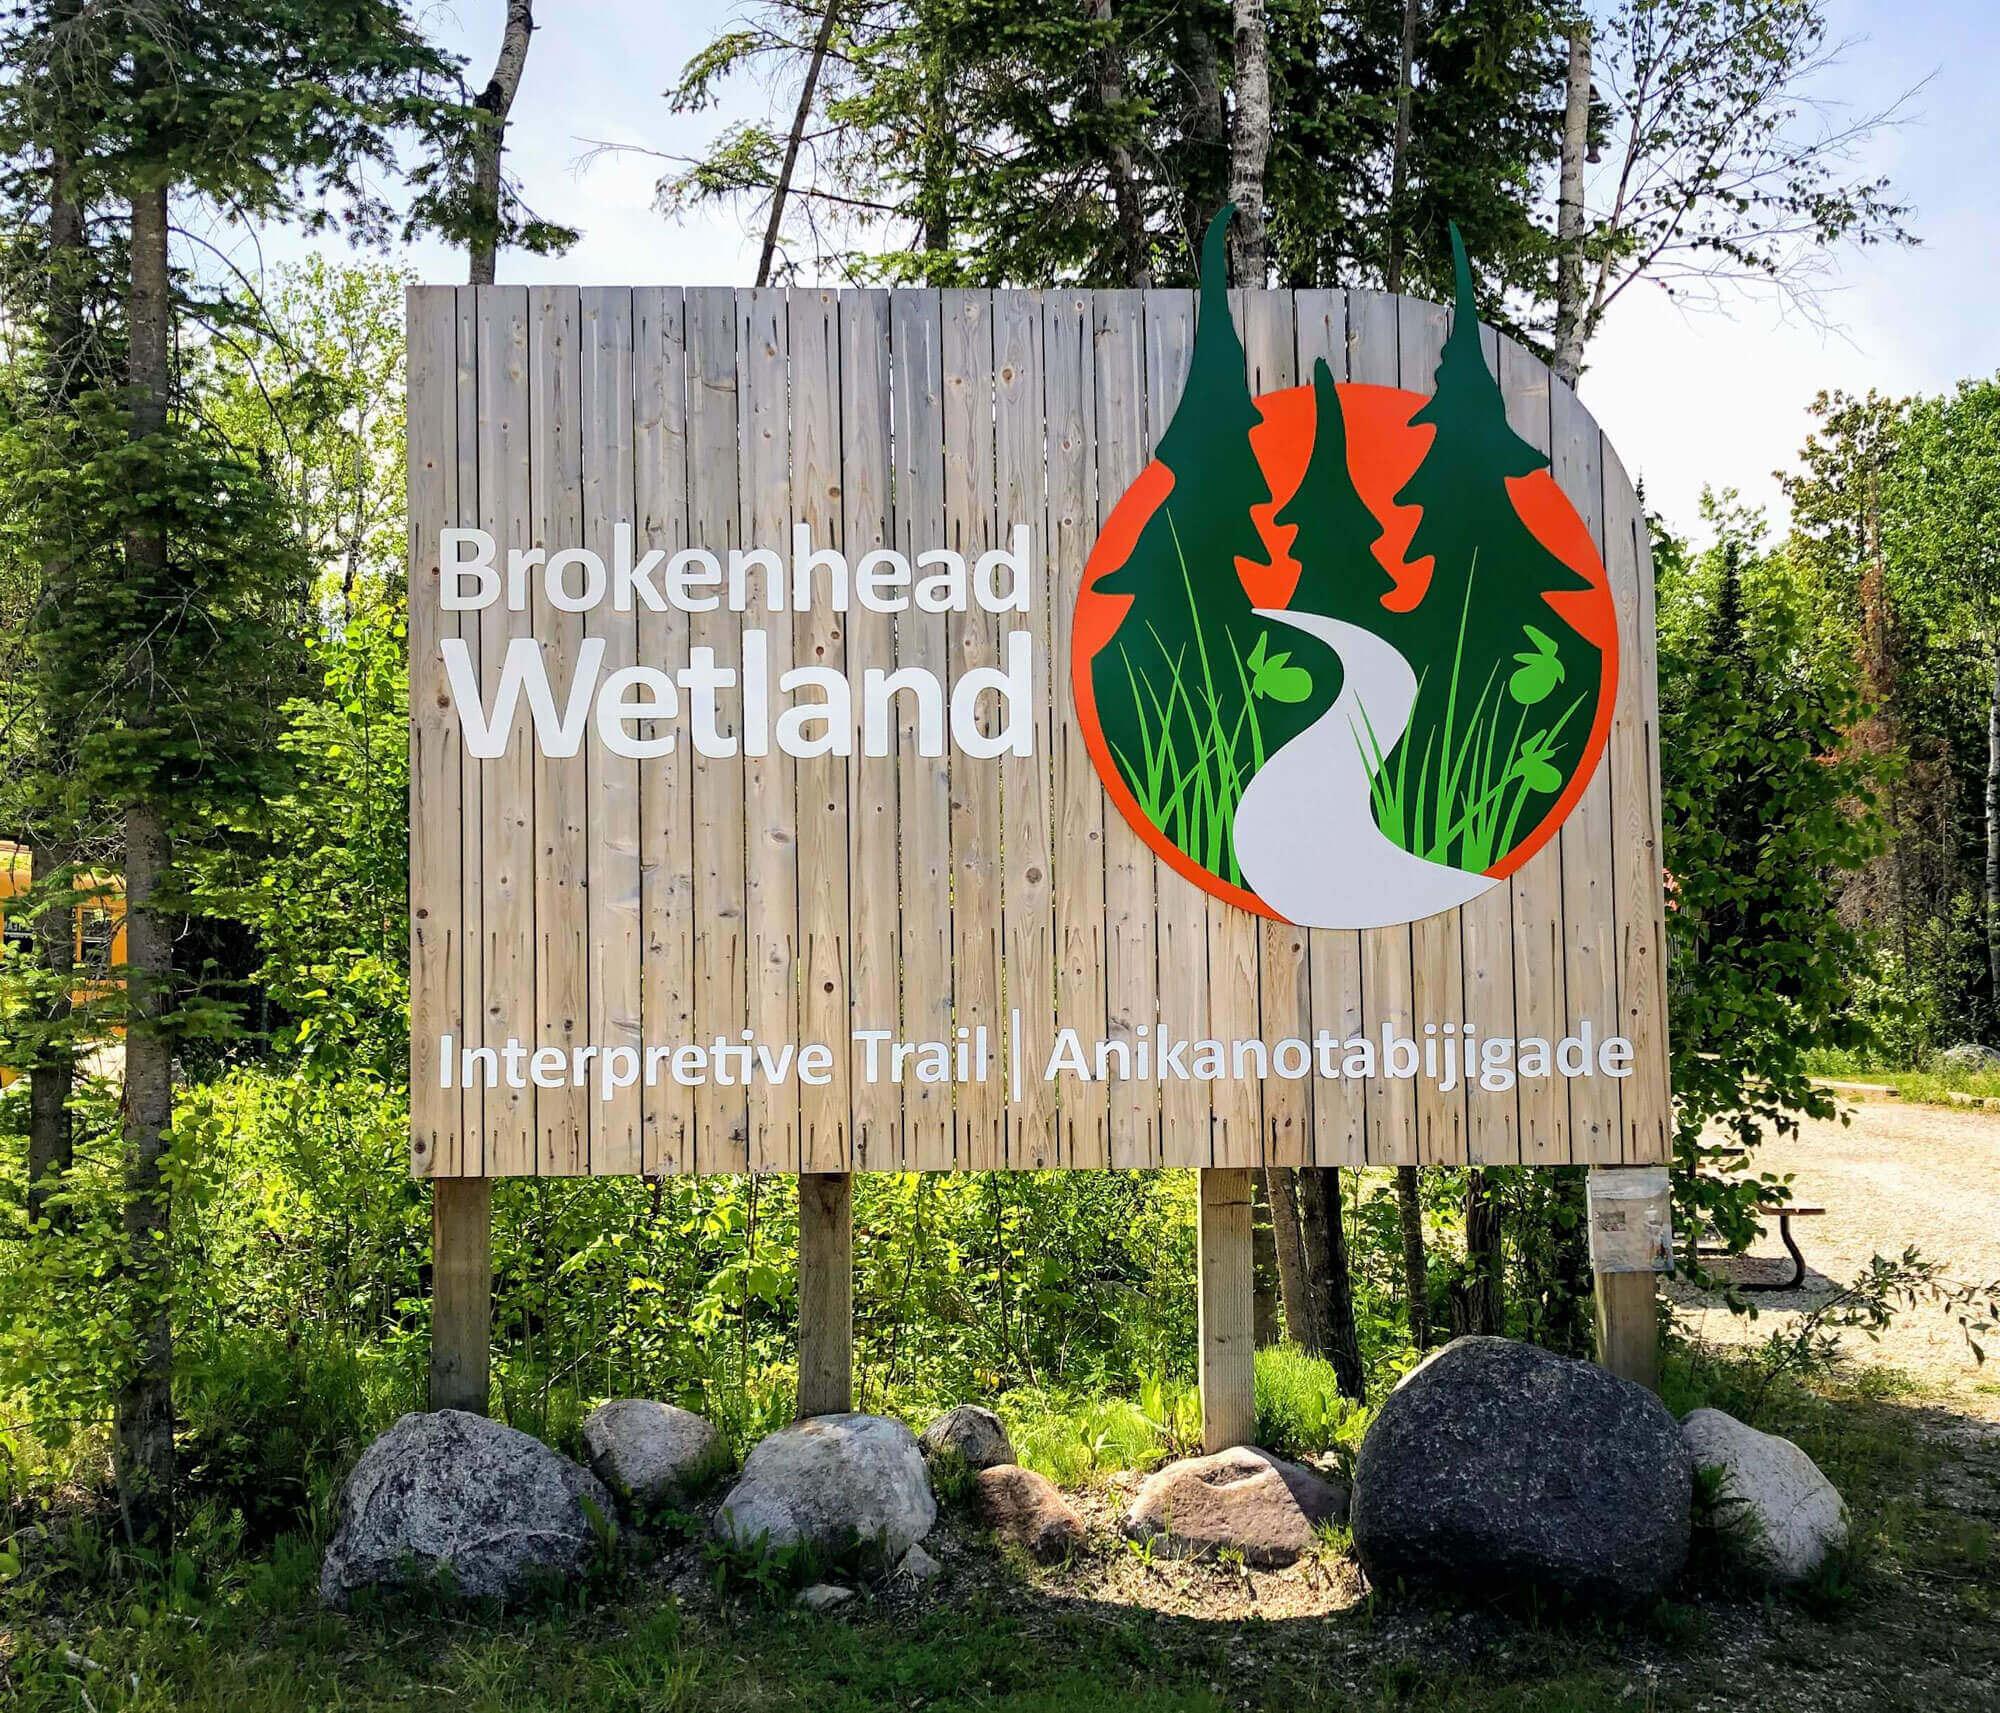 Brokenhead Wetland Interpretive Trail Signage